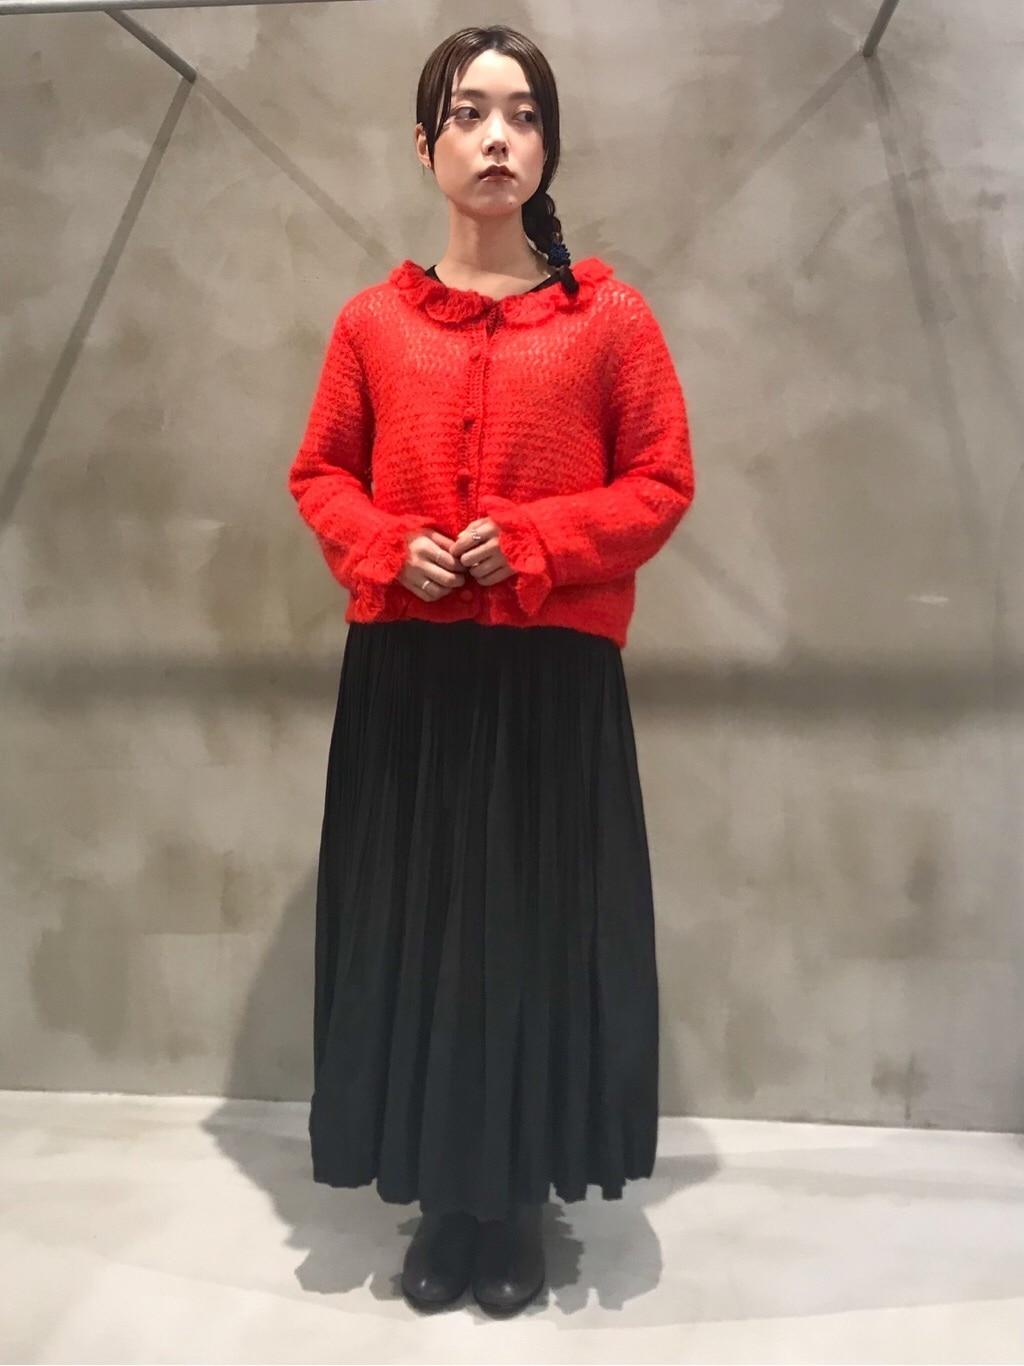 bulle de savon 渋谷スクランブルスクエア 身長:153cm 2020.10.26